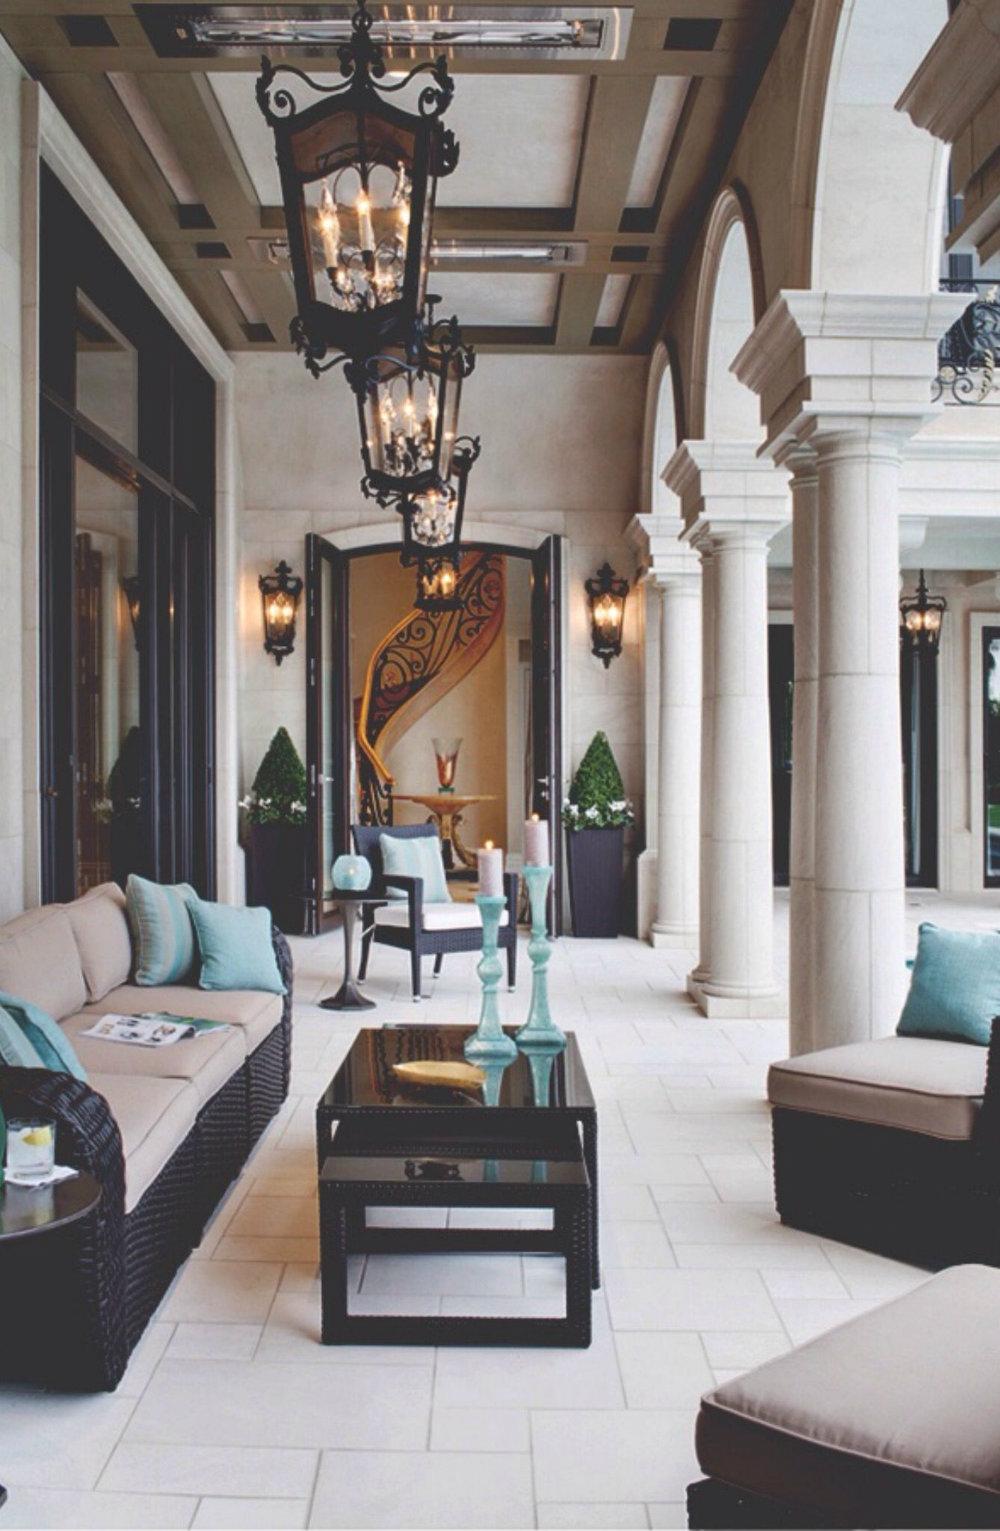 Top 28 Interior Designers in Sydney best interior projects in sydney Best Interior Projects in Sydney 7 Stunning Patio Design Ideas For This Summer 03